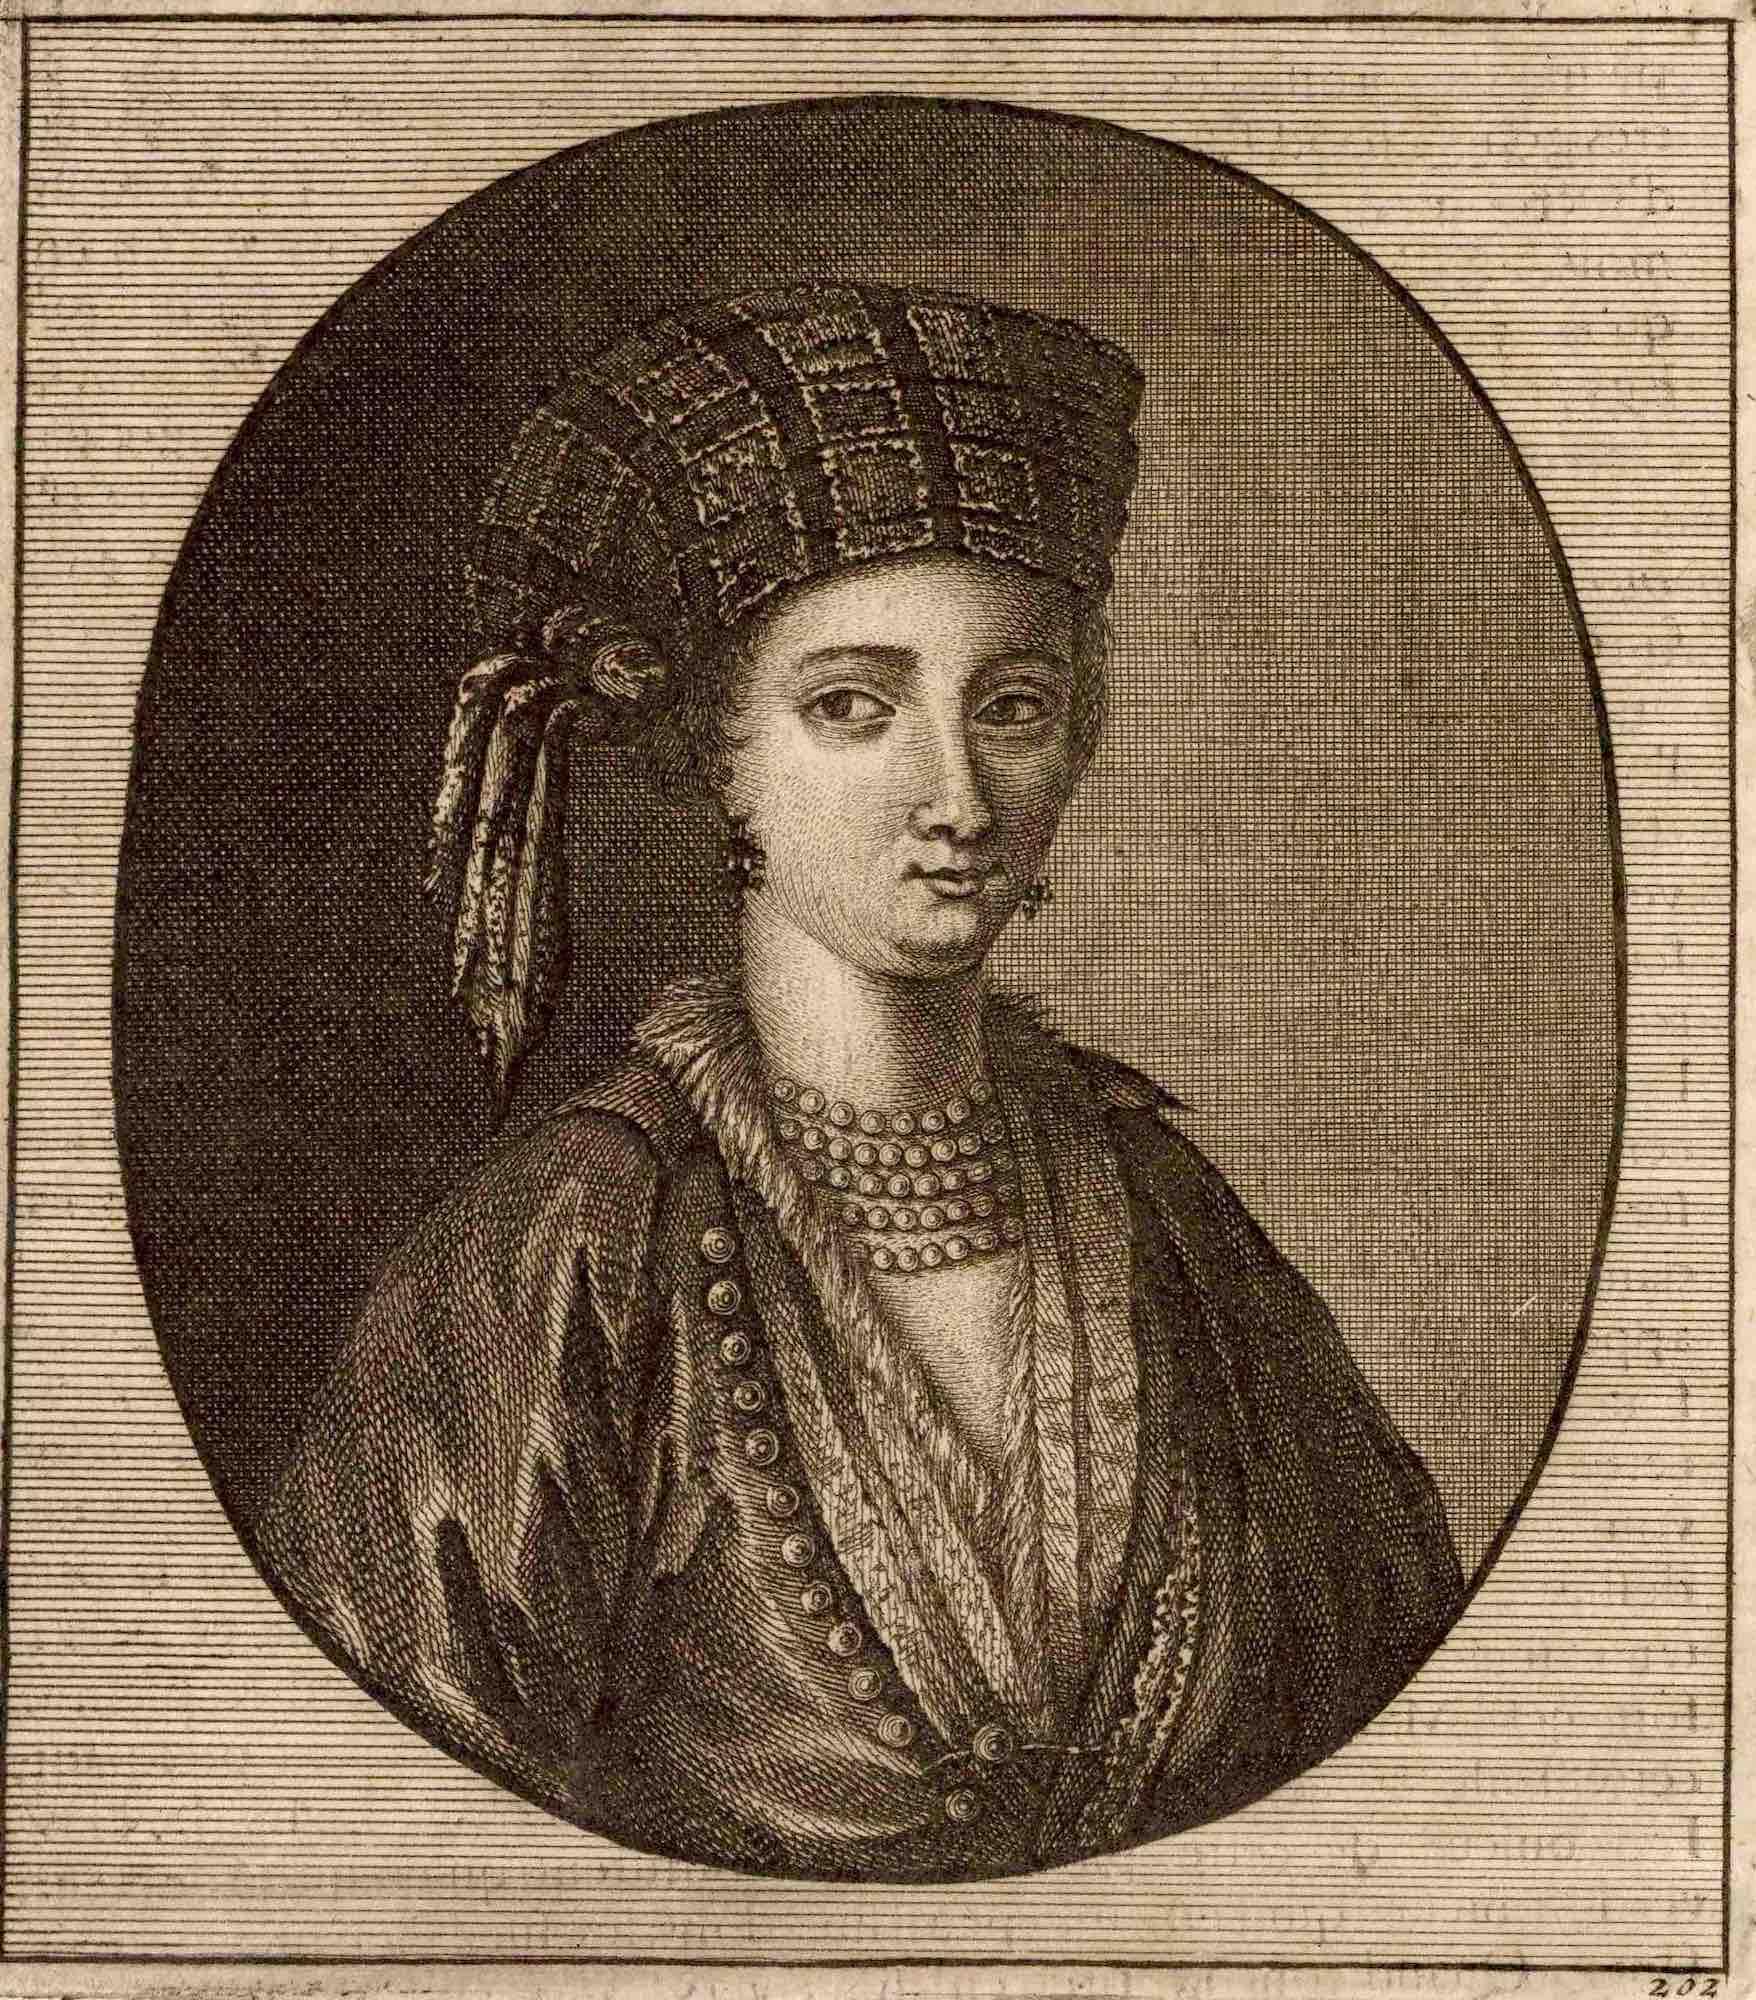 06a. Cornelis De Bruyns | Cypriot woman